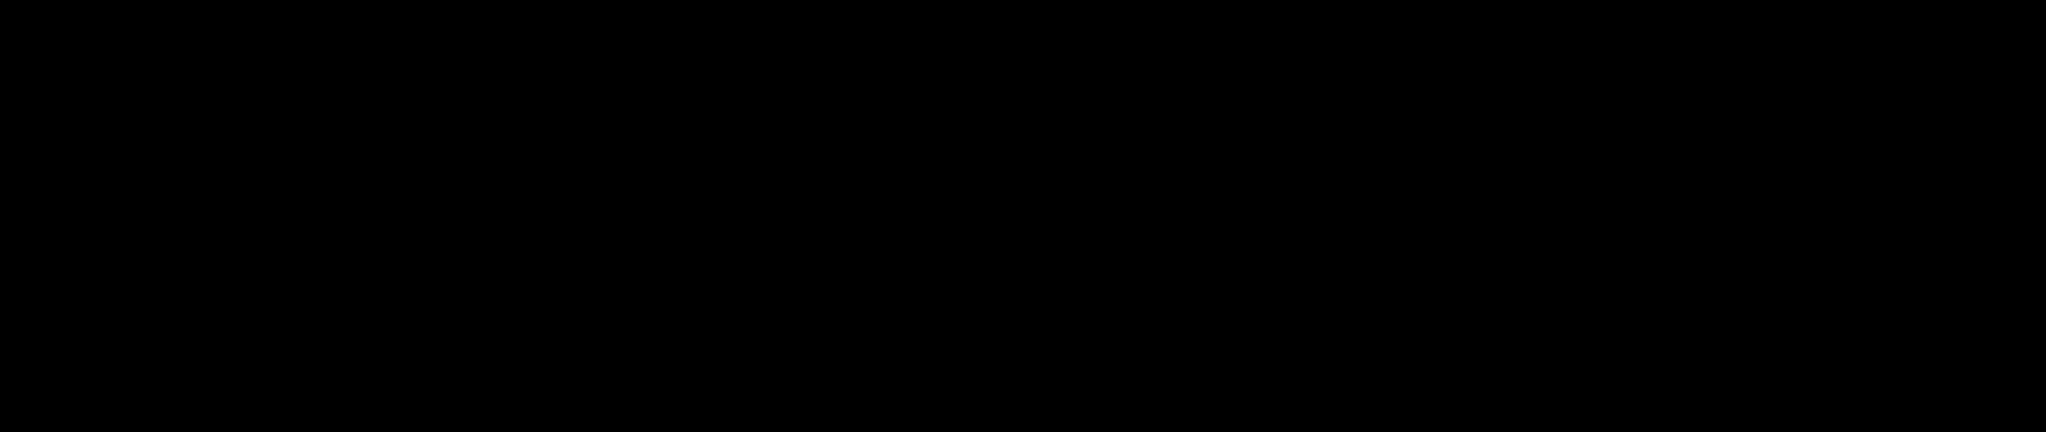 the-washington-post-logo-png-transparent-1.jpg